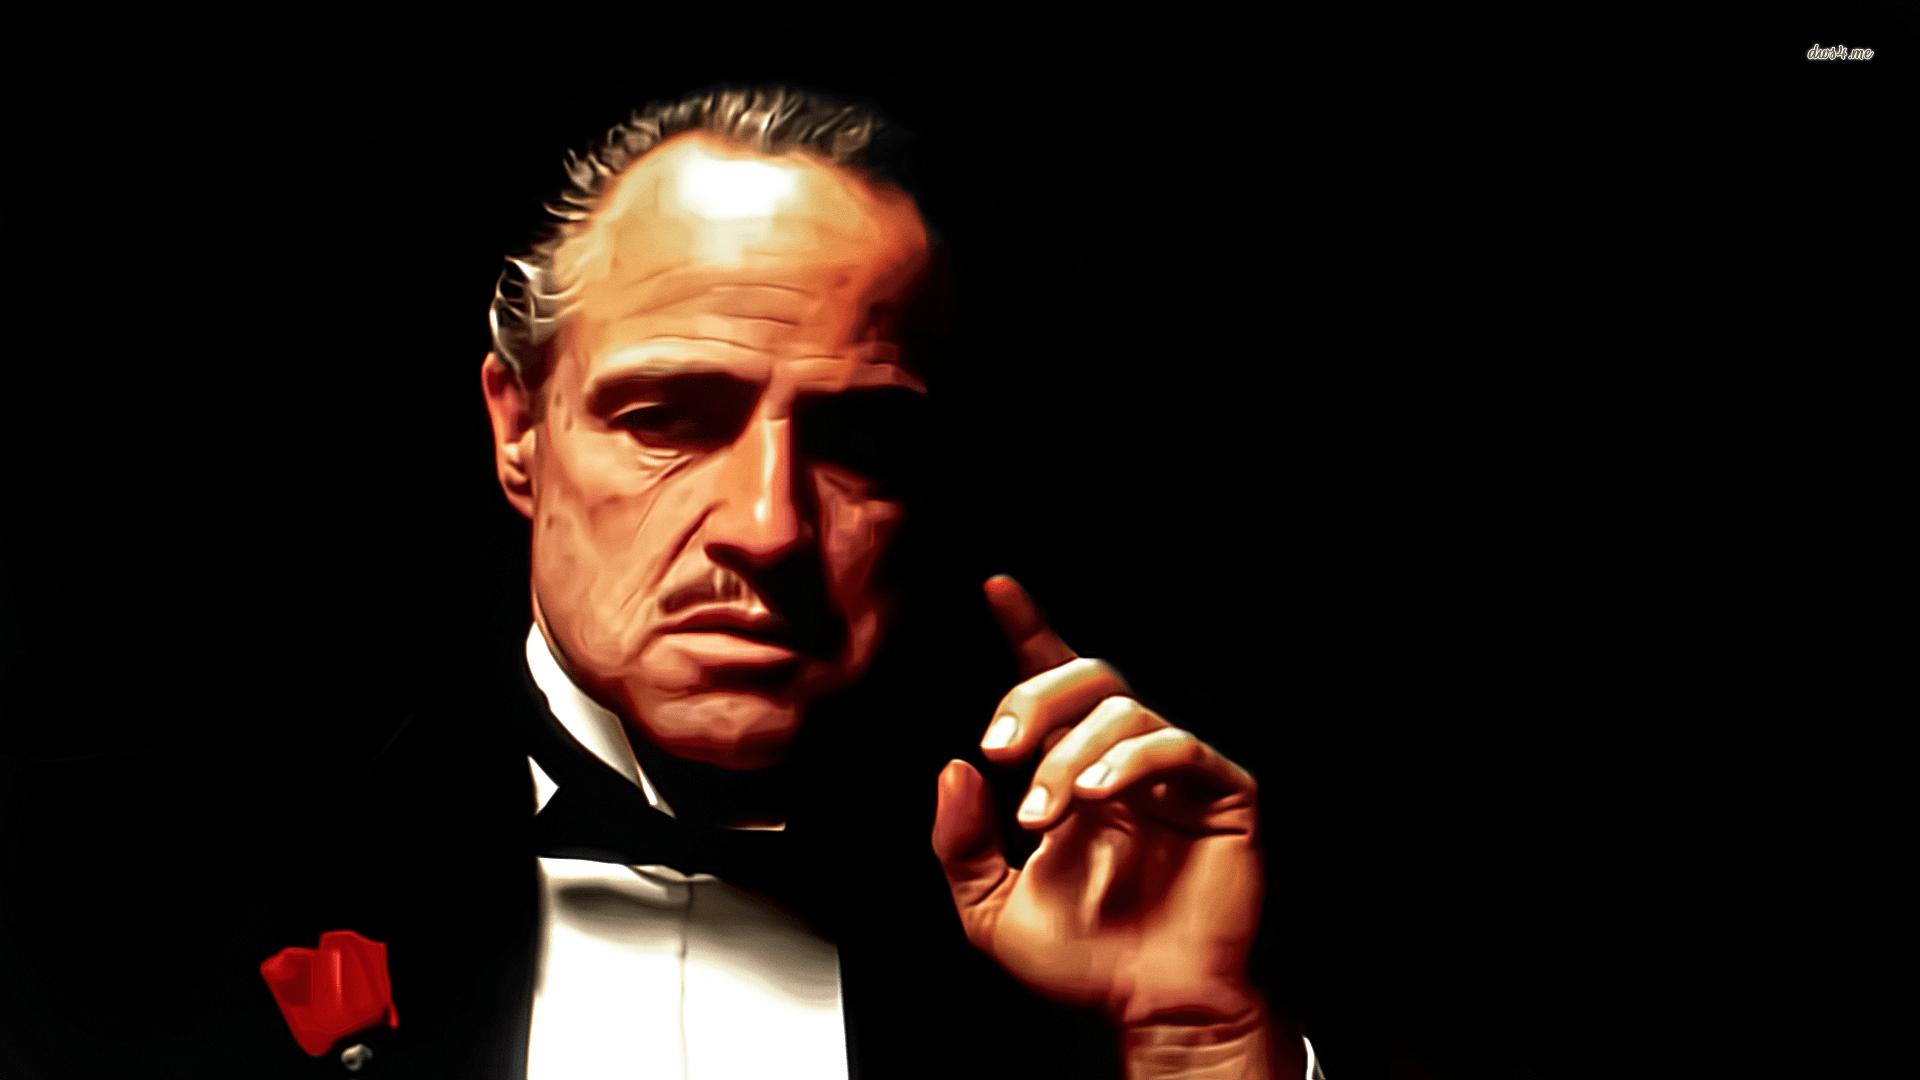 Michael Corleone Wallpapers - Wallpaper Cave